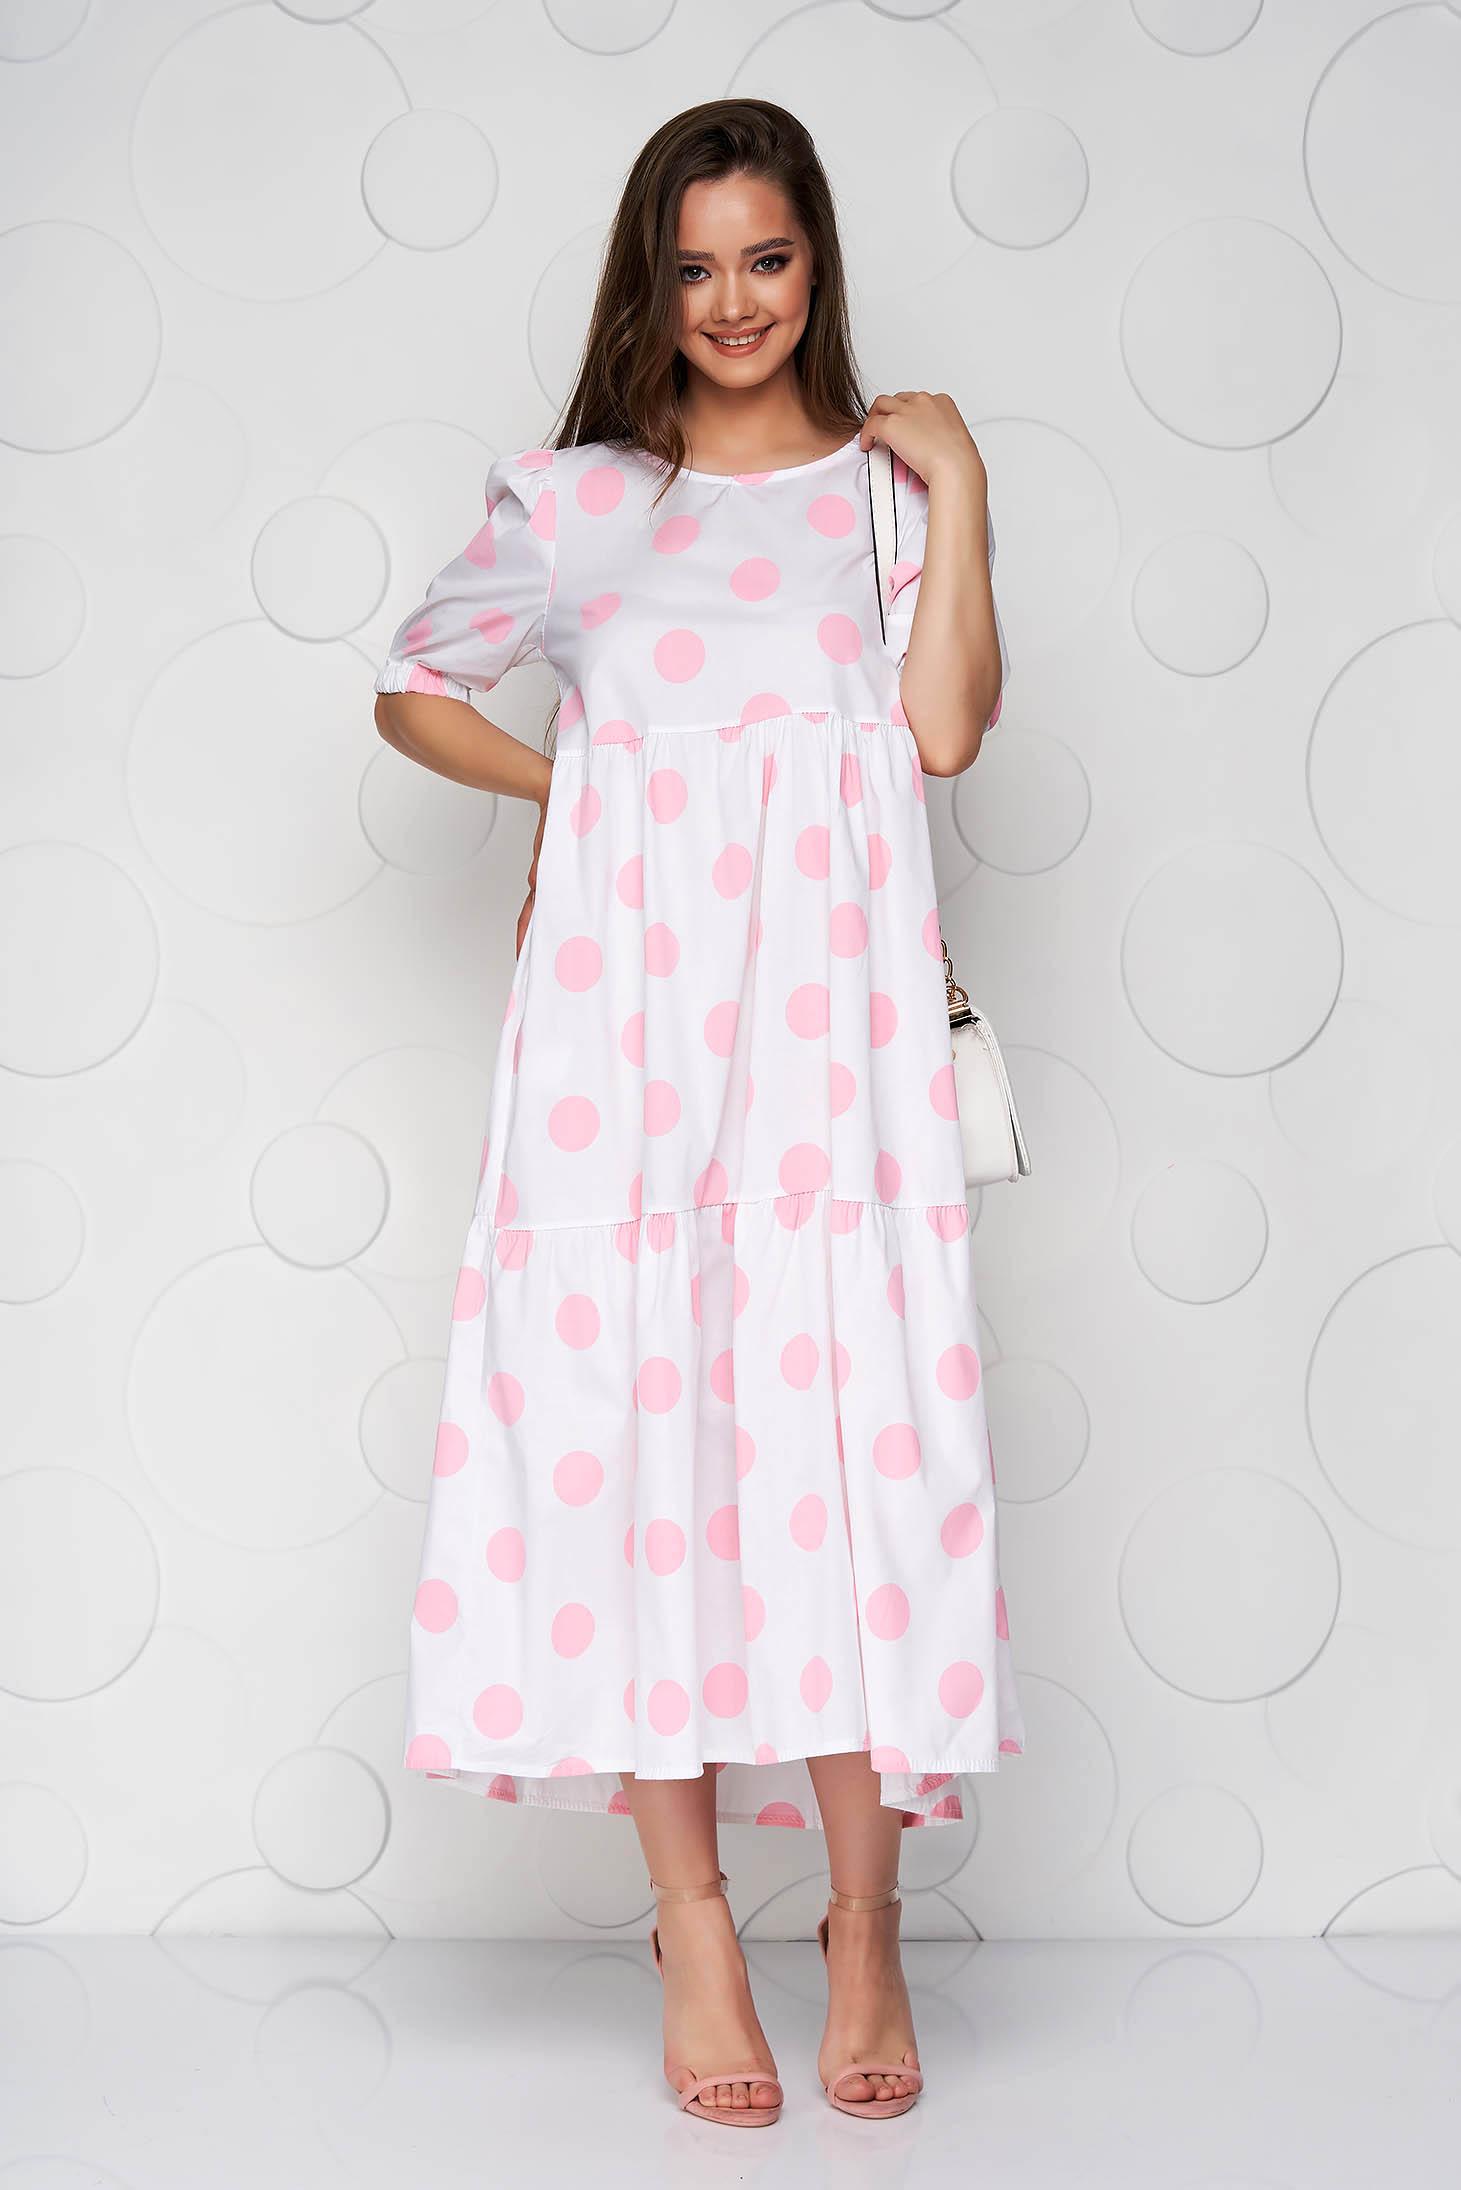 Rochie roz cu buline din material vaporos cu croi larg si volanase